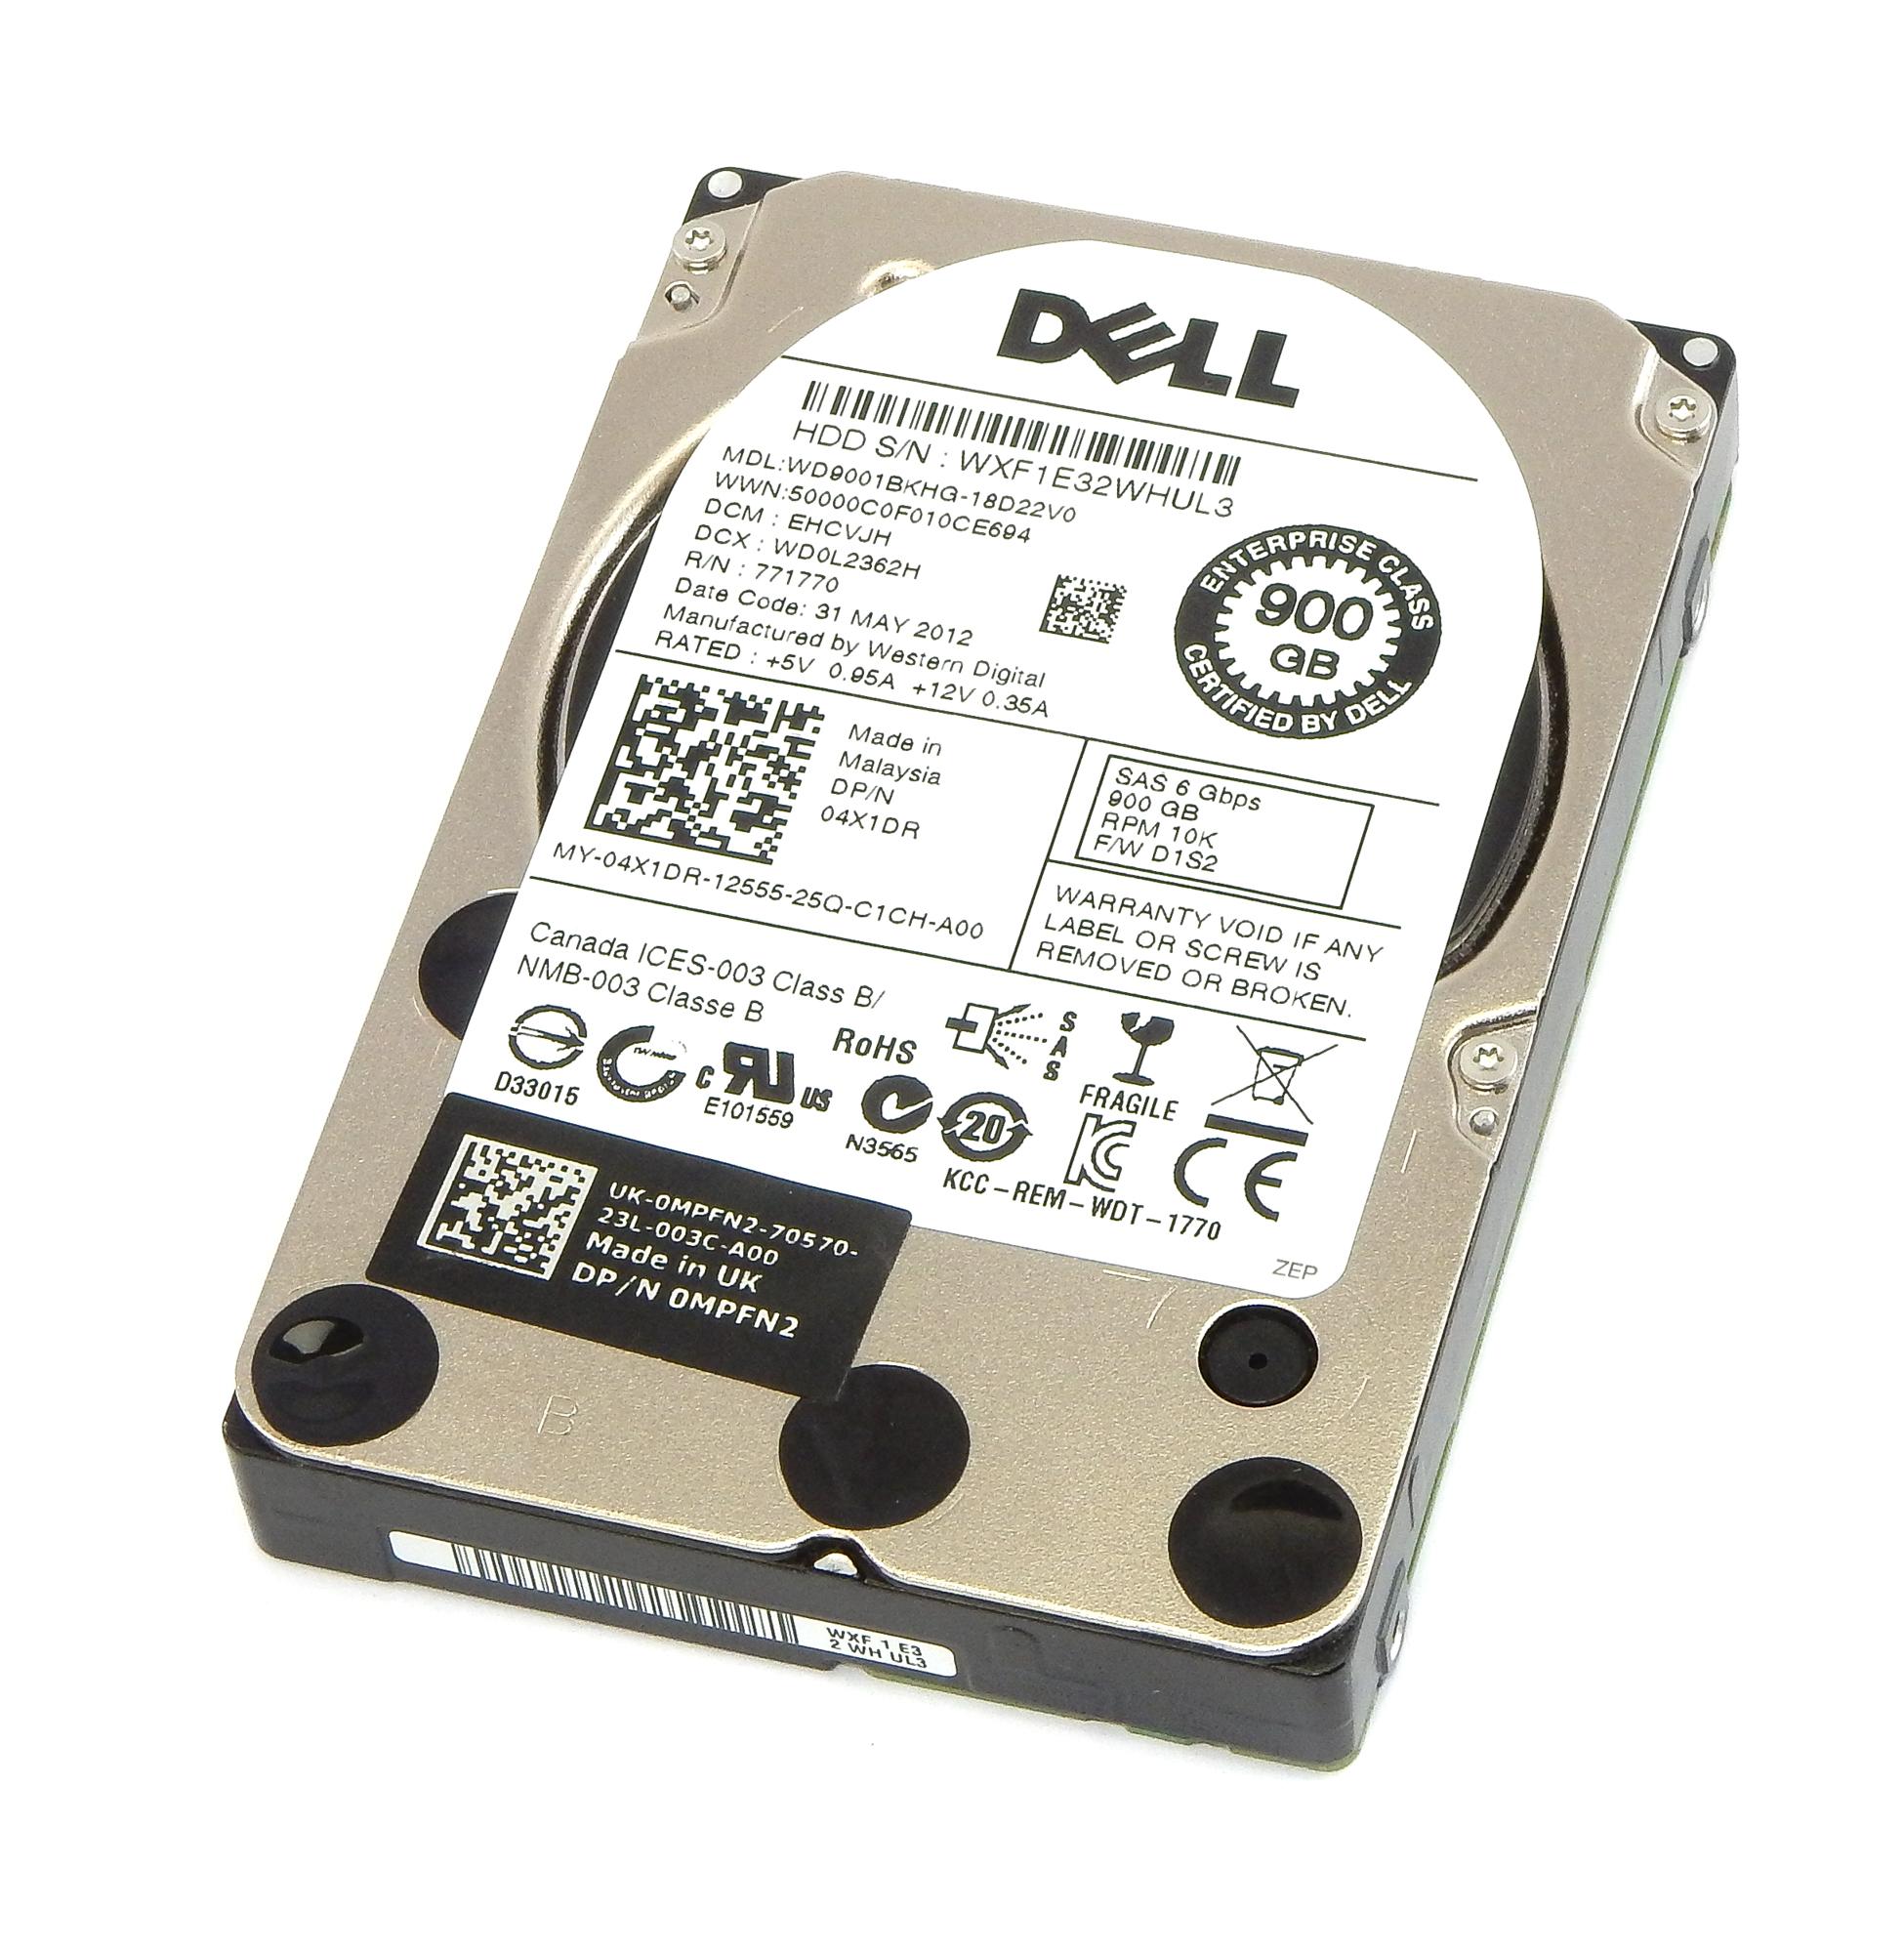 "Dell 4X1DR WD WD9001BKHG-18D22V0 2.5"" 10K 900GB SAS Hard Drive"